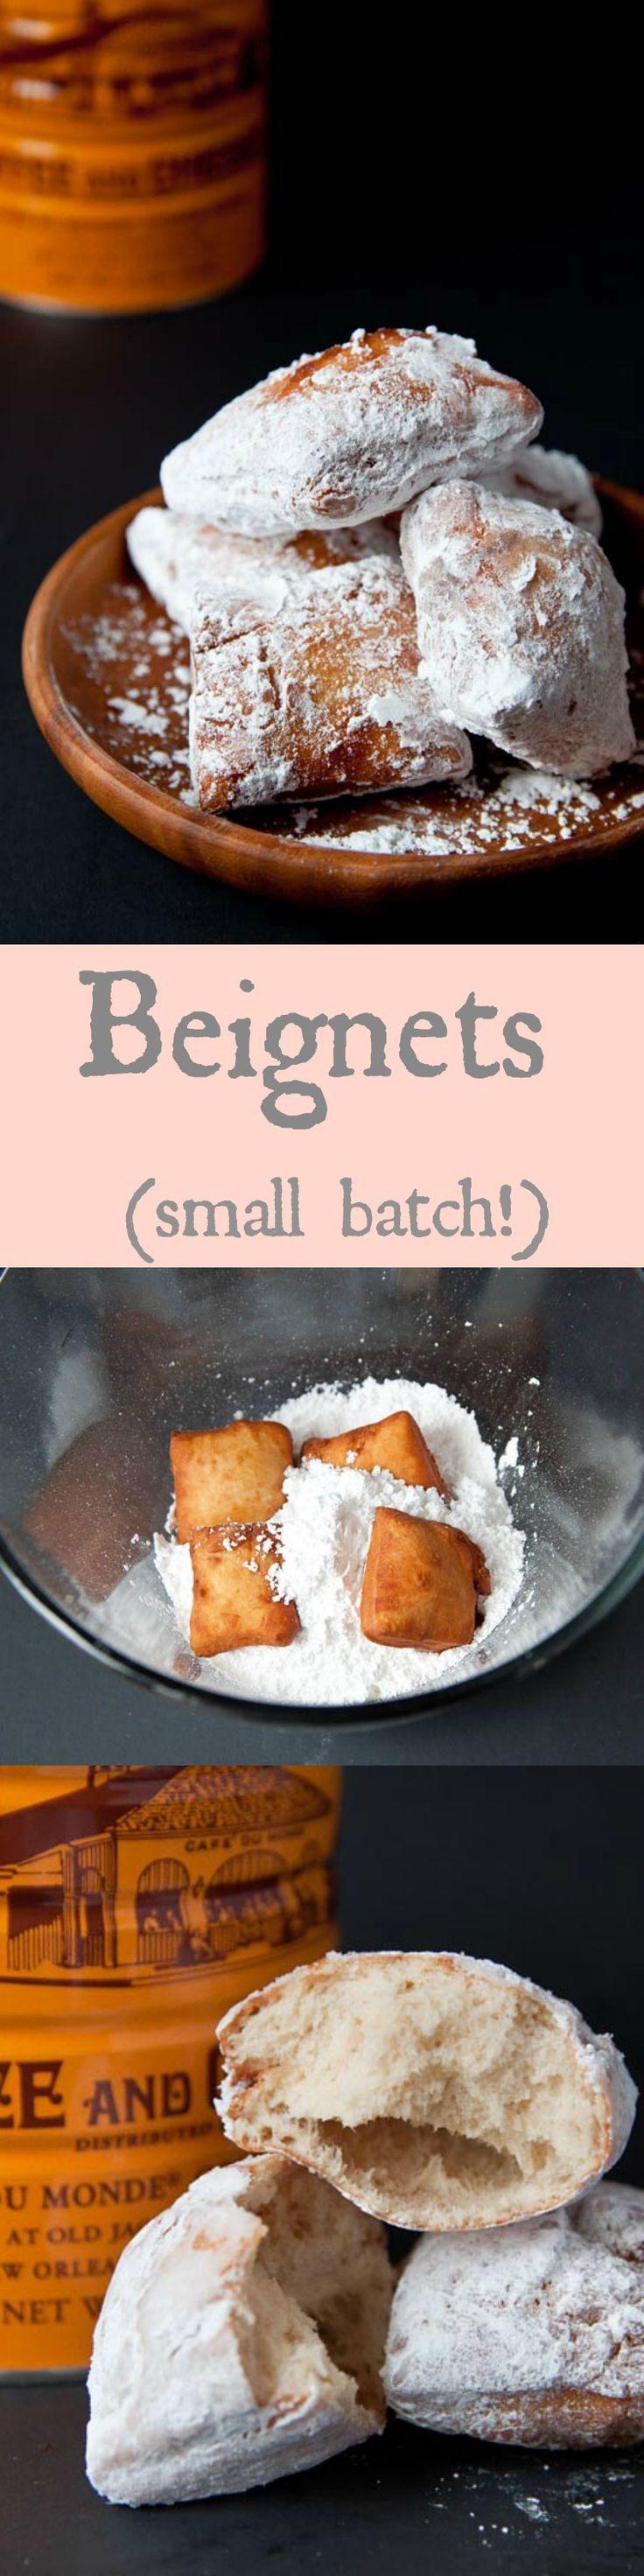 Beignets made from scratch! Just like Cafe du Monde.  #Desserts #ShermanFinancialGroup